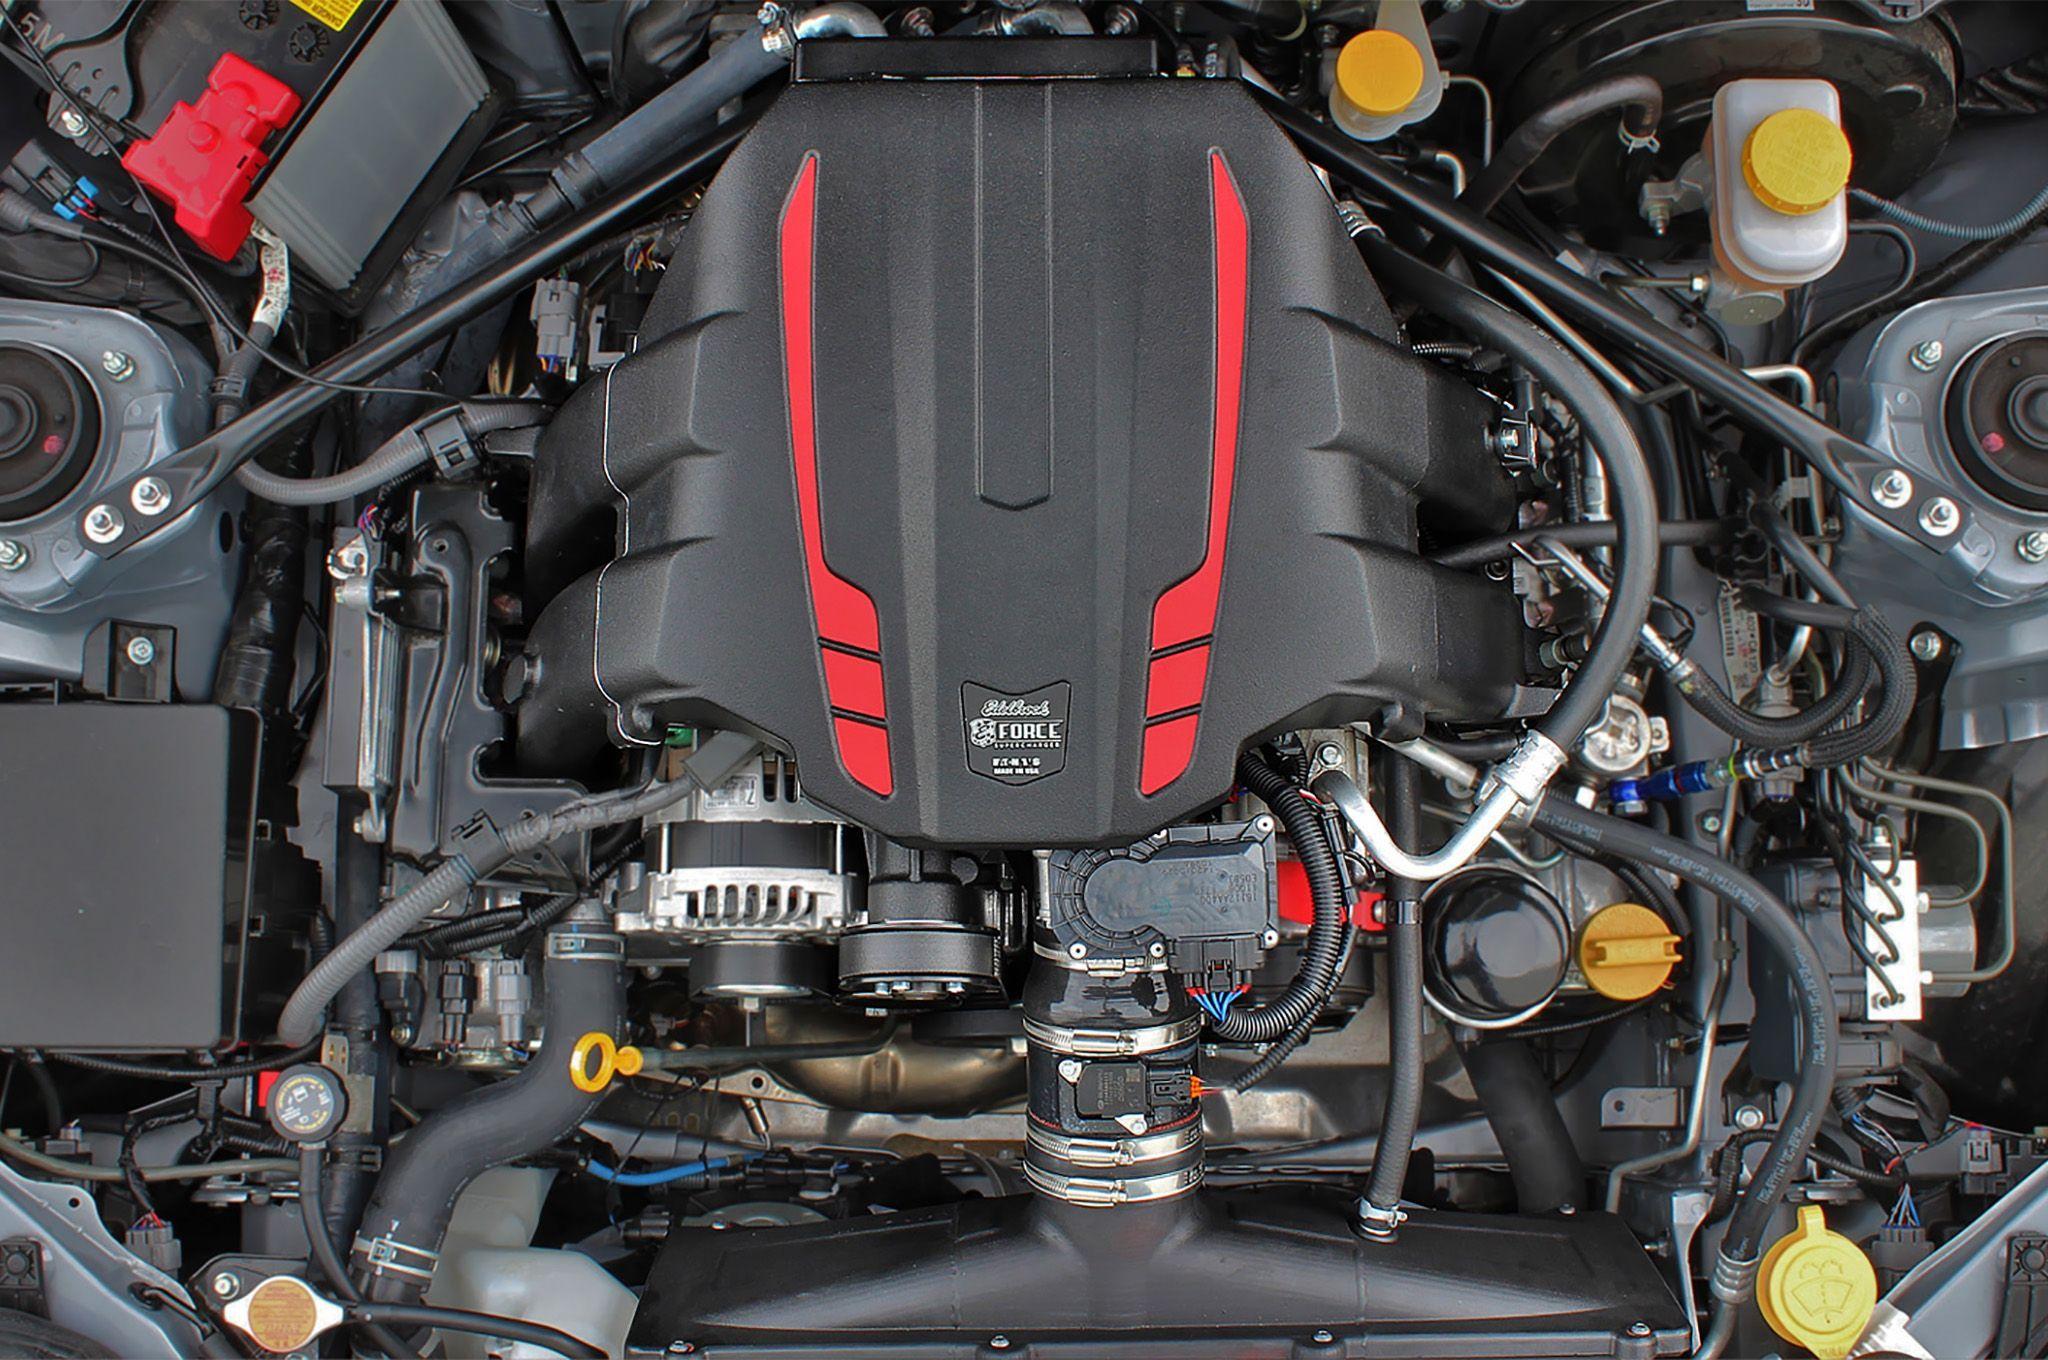 Edelbrock E Force Supercharger System For Fr S Brz Supercharger Subaru Brz Car Mods